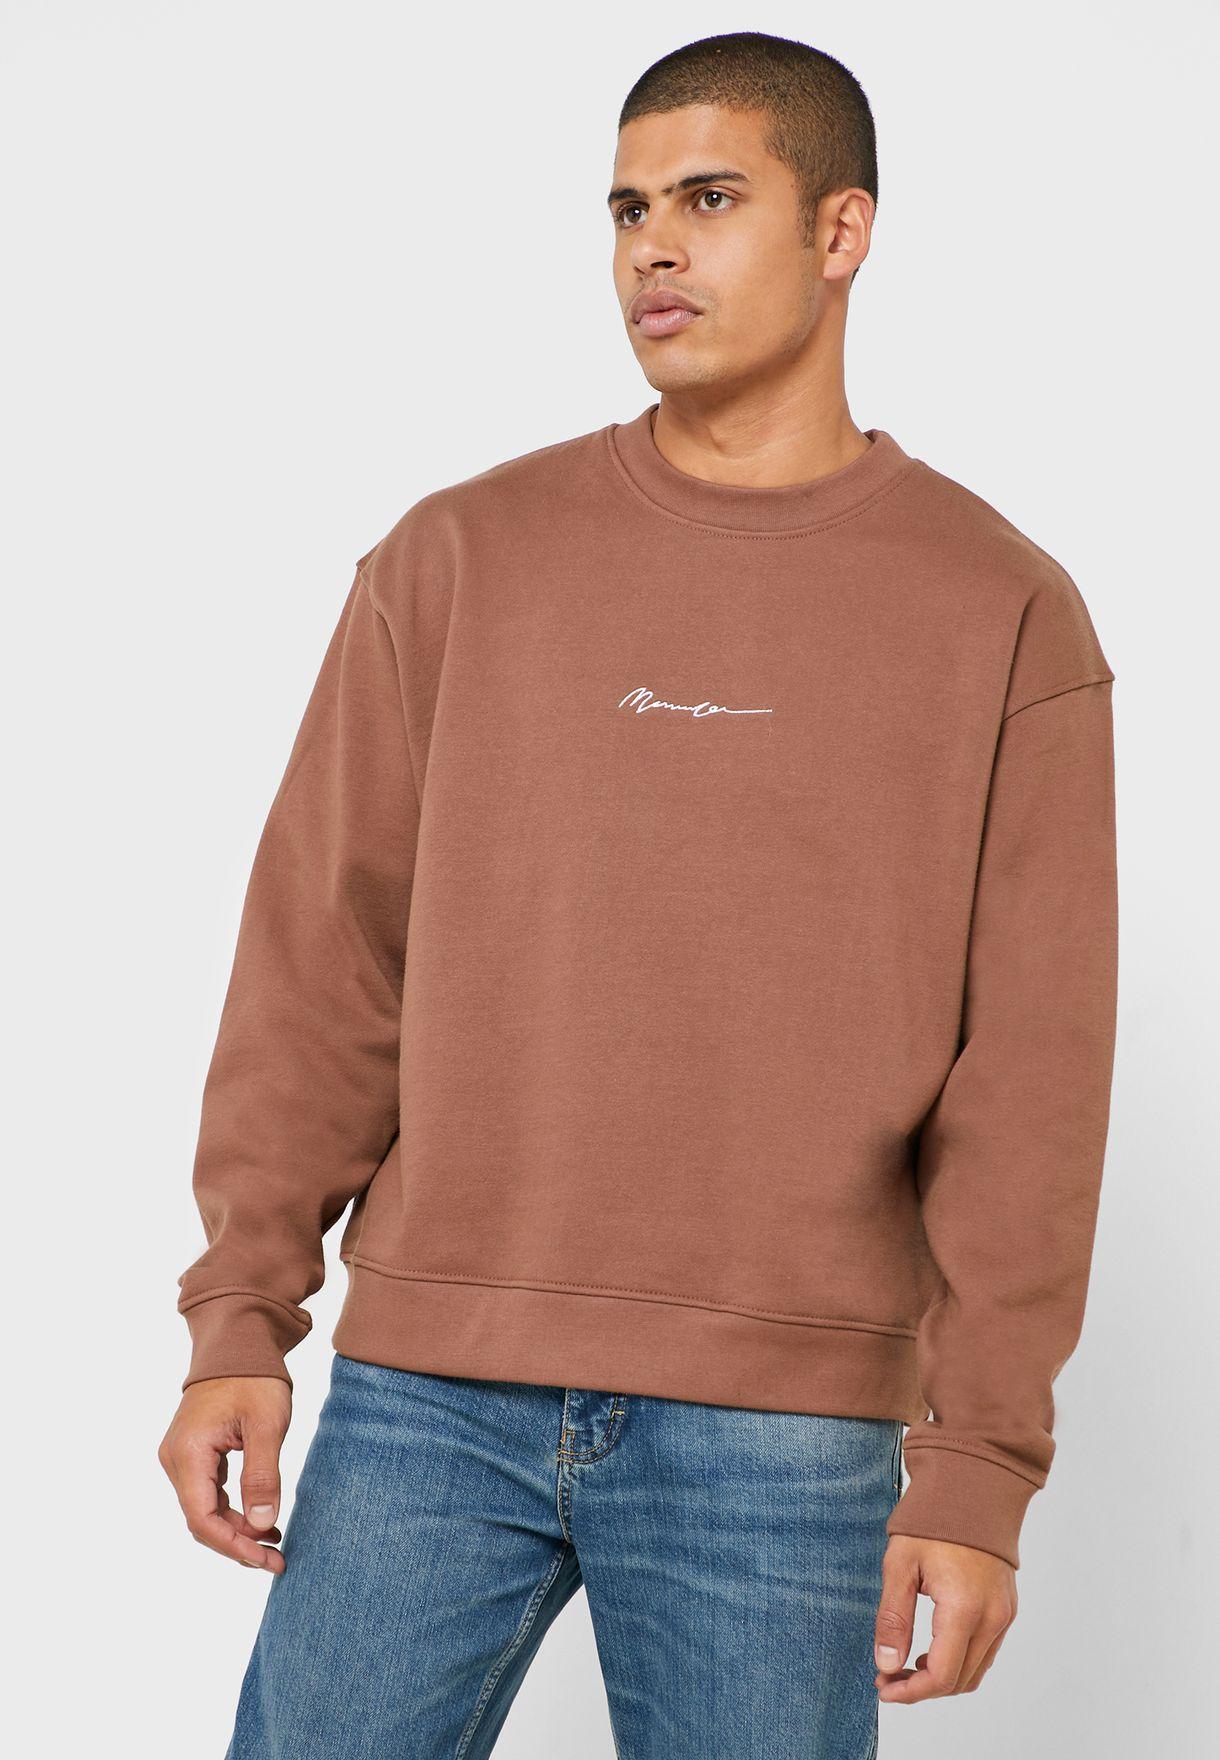 Signature Boxy Sweatshirt